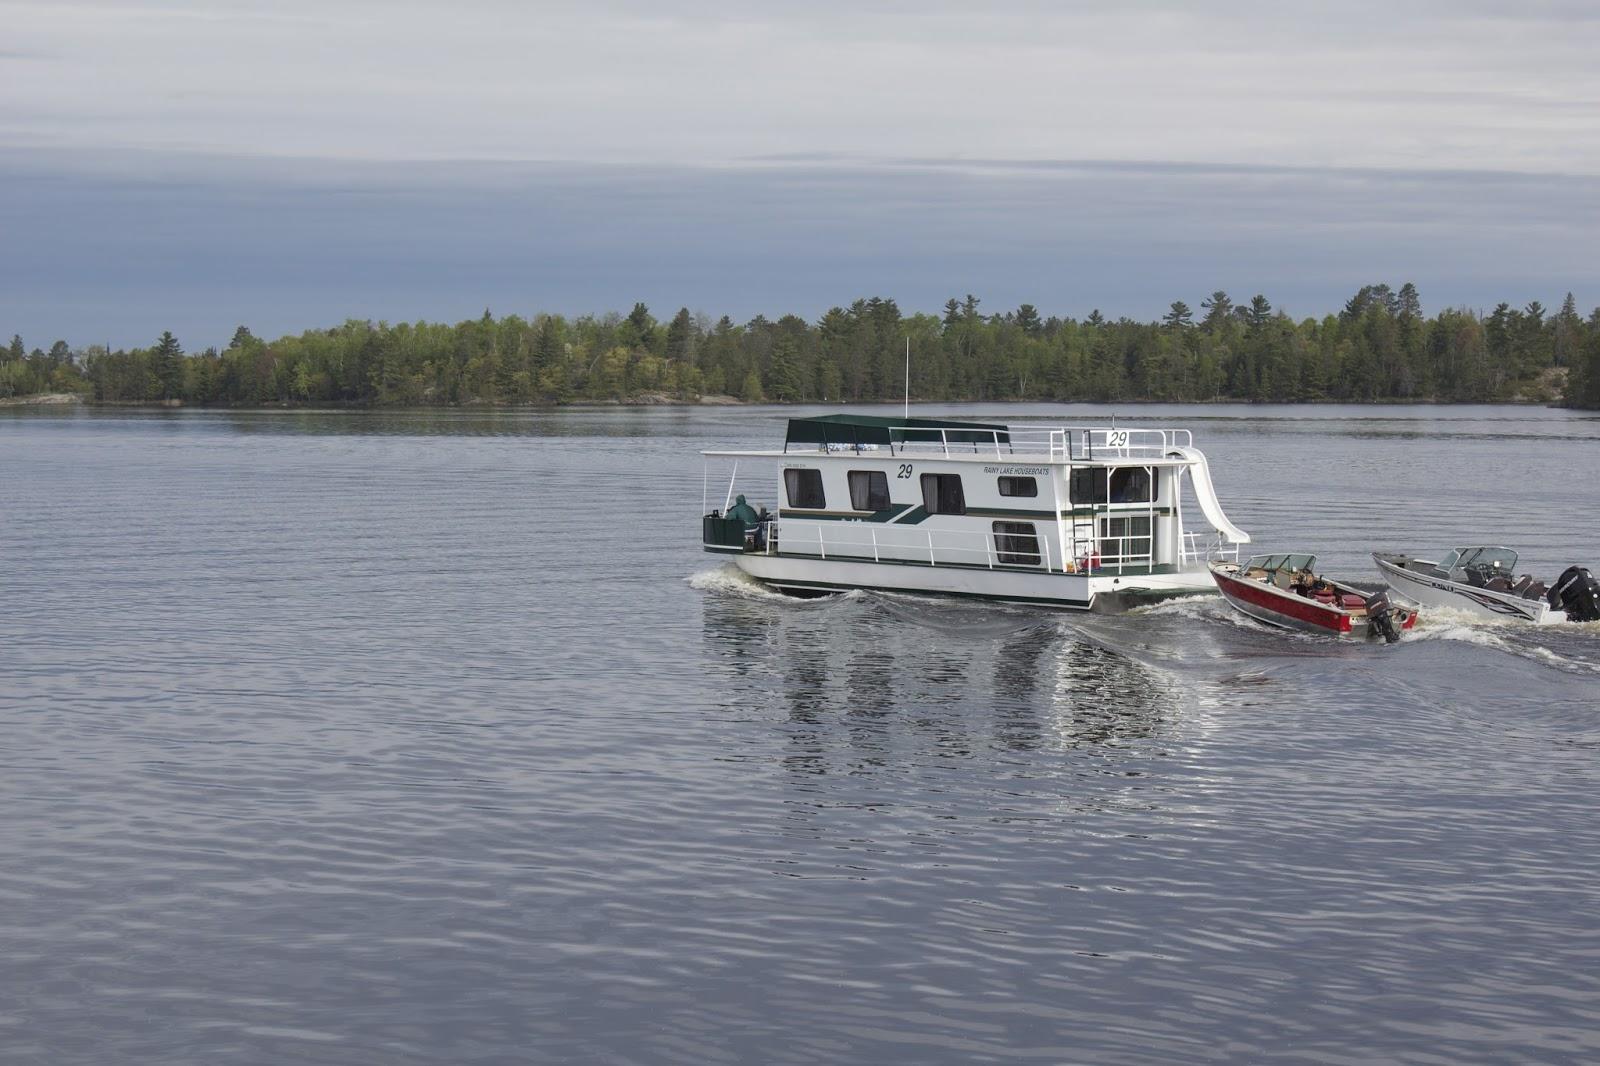 Rainy lake houseboats fishing report roger cormier and for Rainy lake fishing